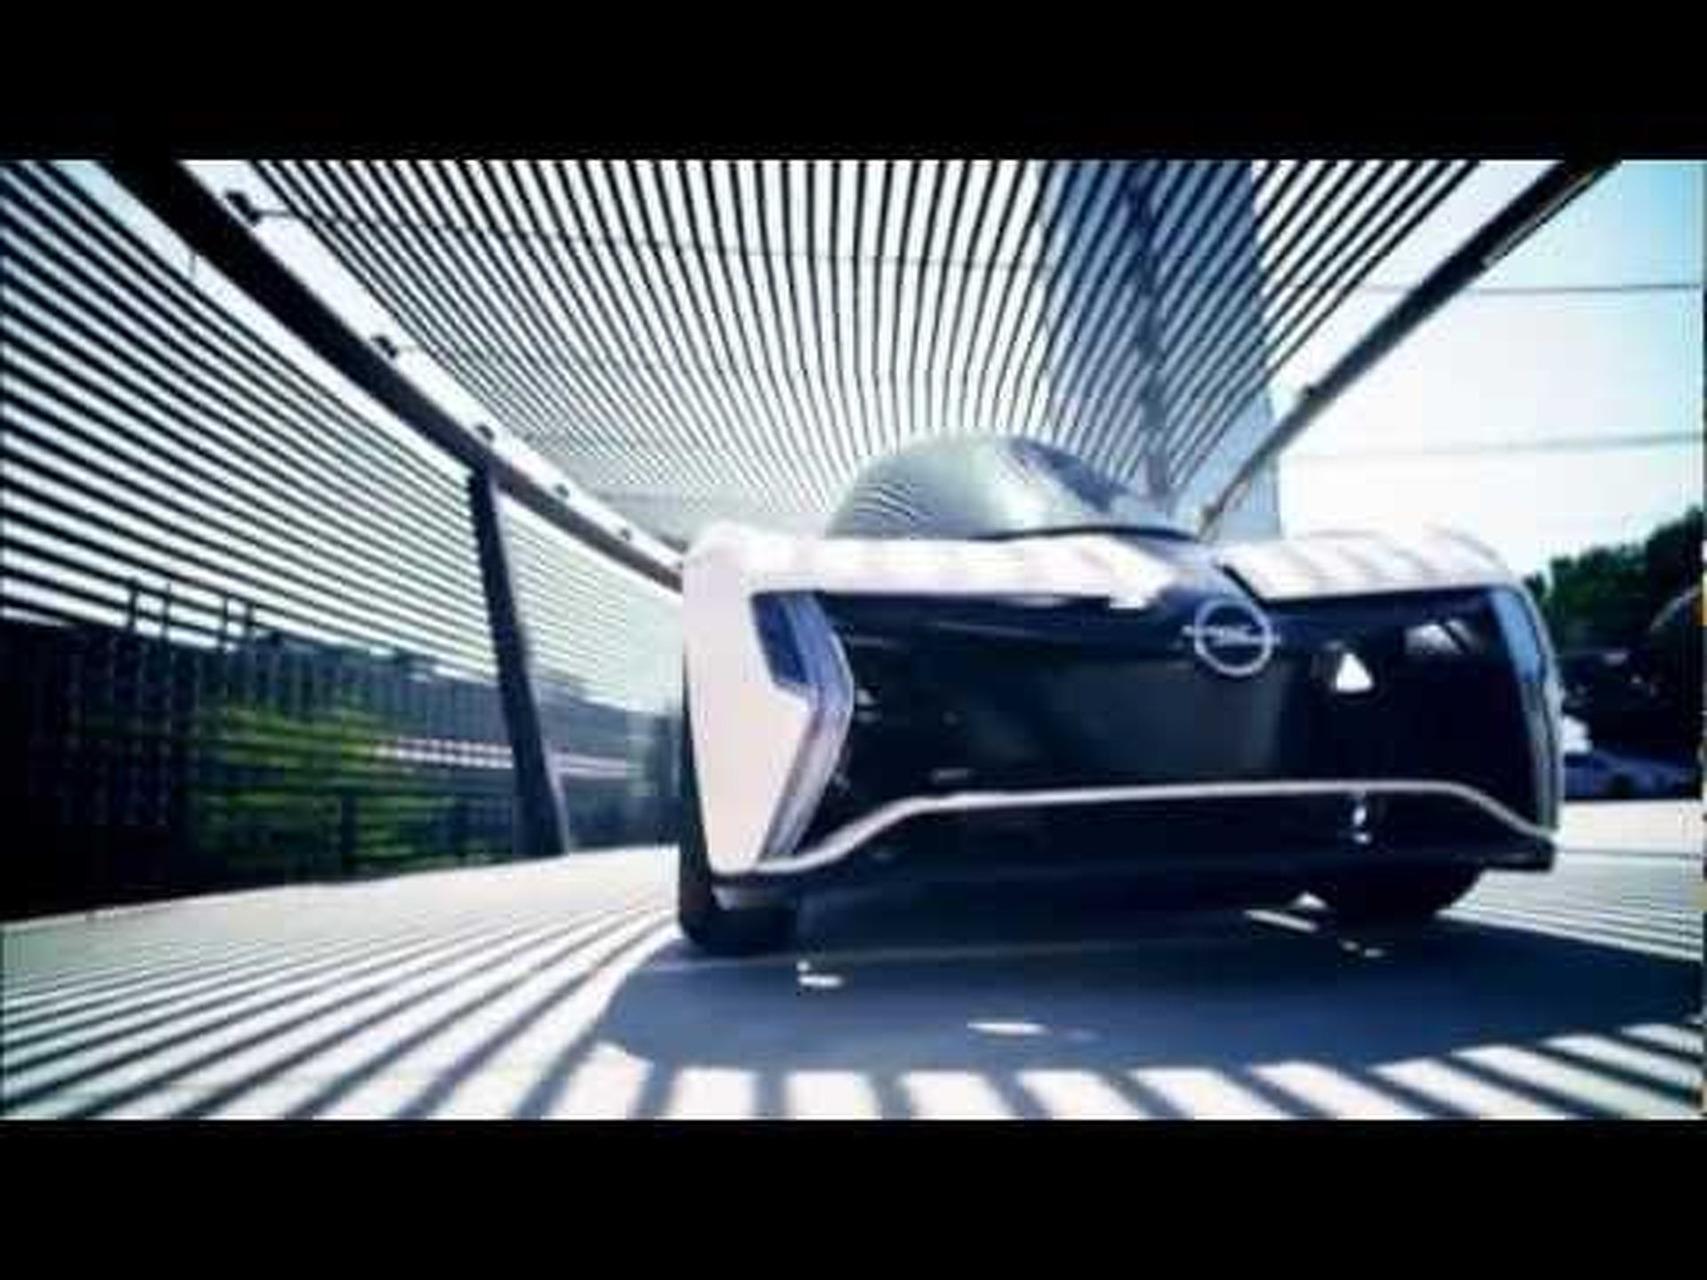 2011 Opel RAK e Concept - 2011 Frankfurt Motor Show Video